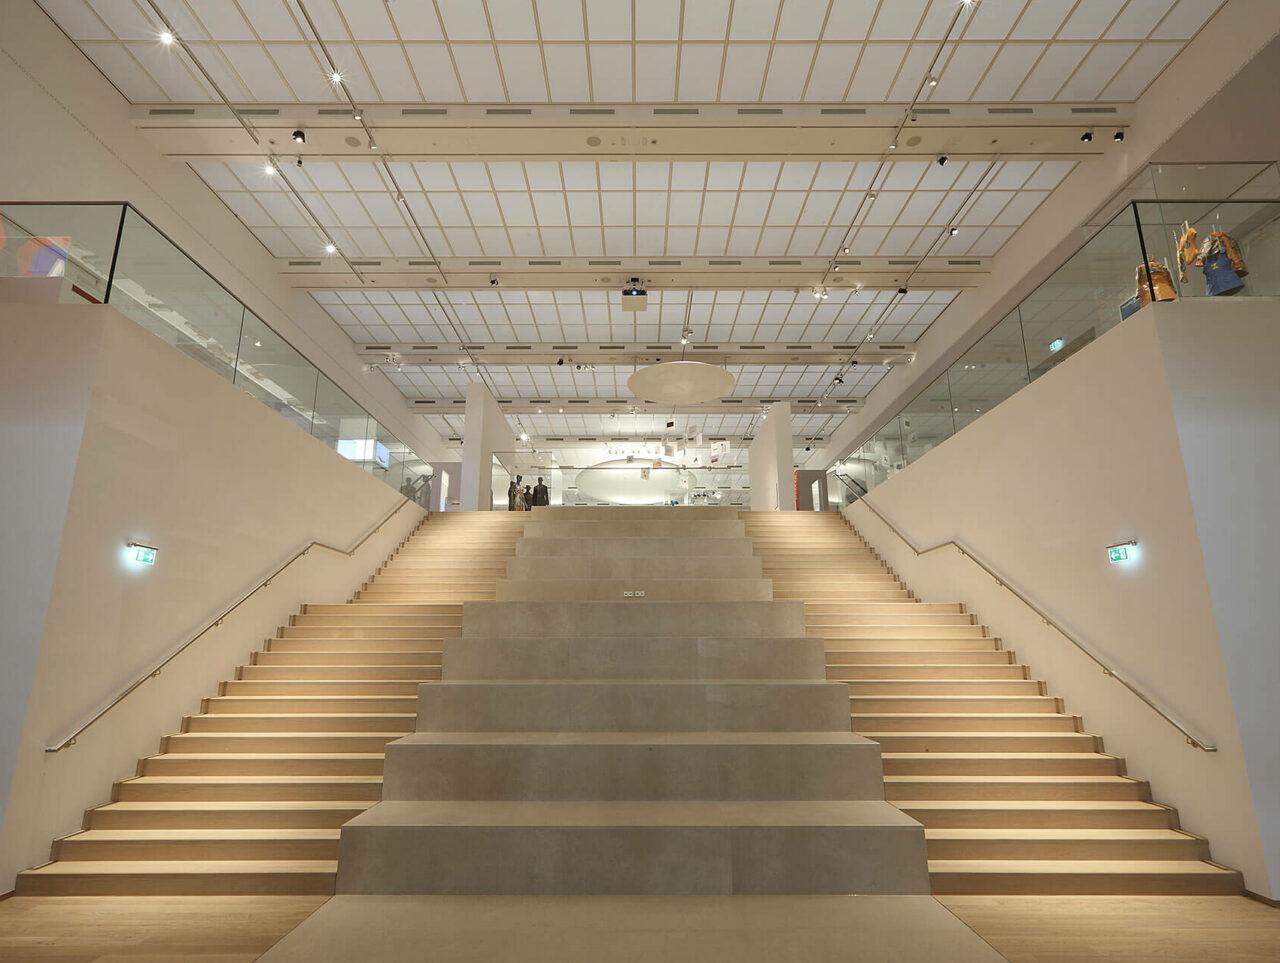 Draiflessen Mettingen Kunstmuseum C&A Treppenhaus